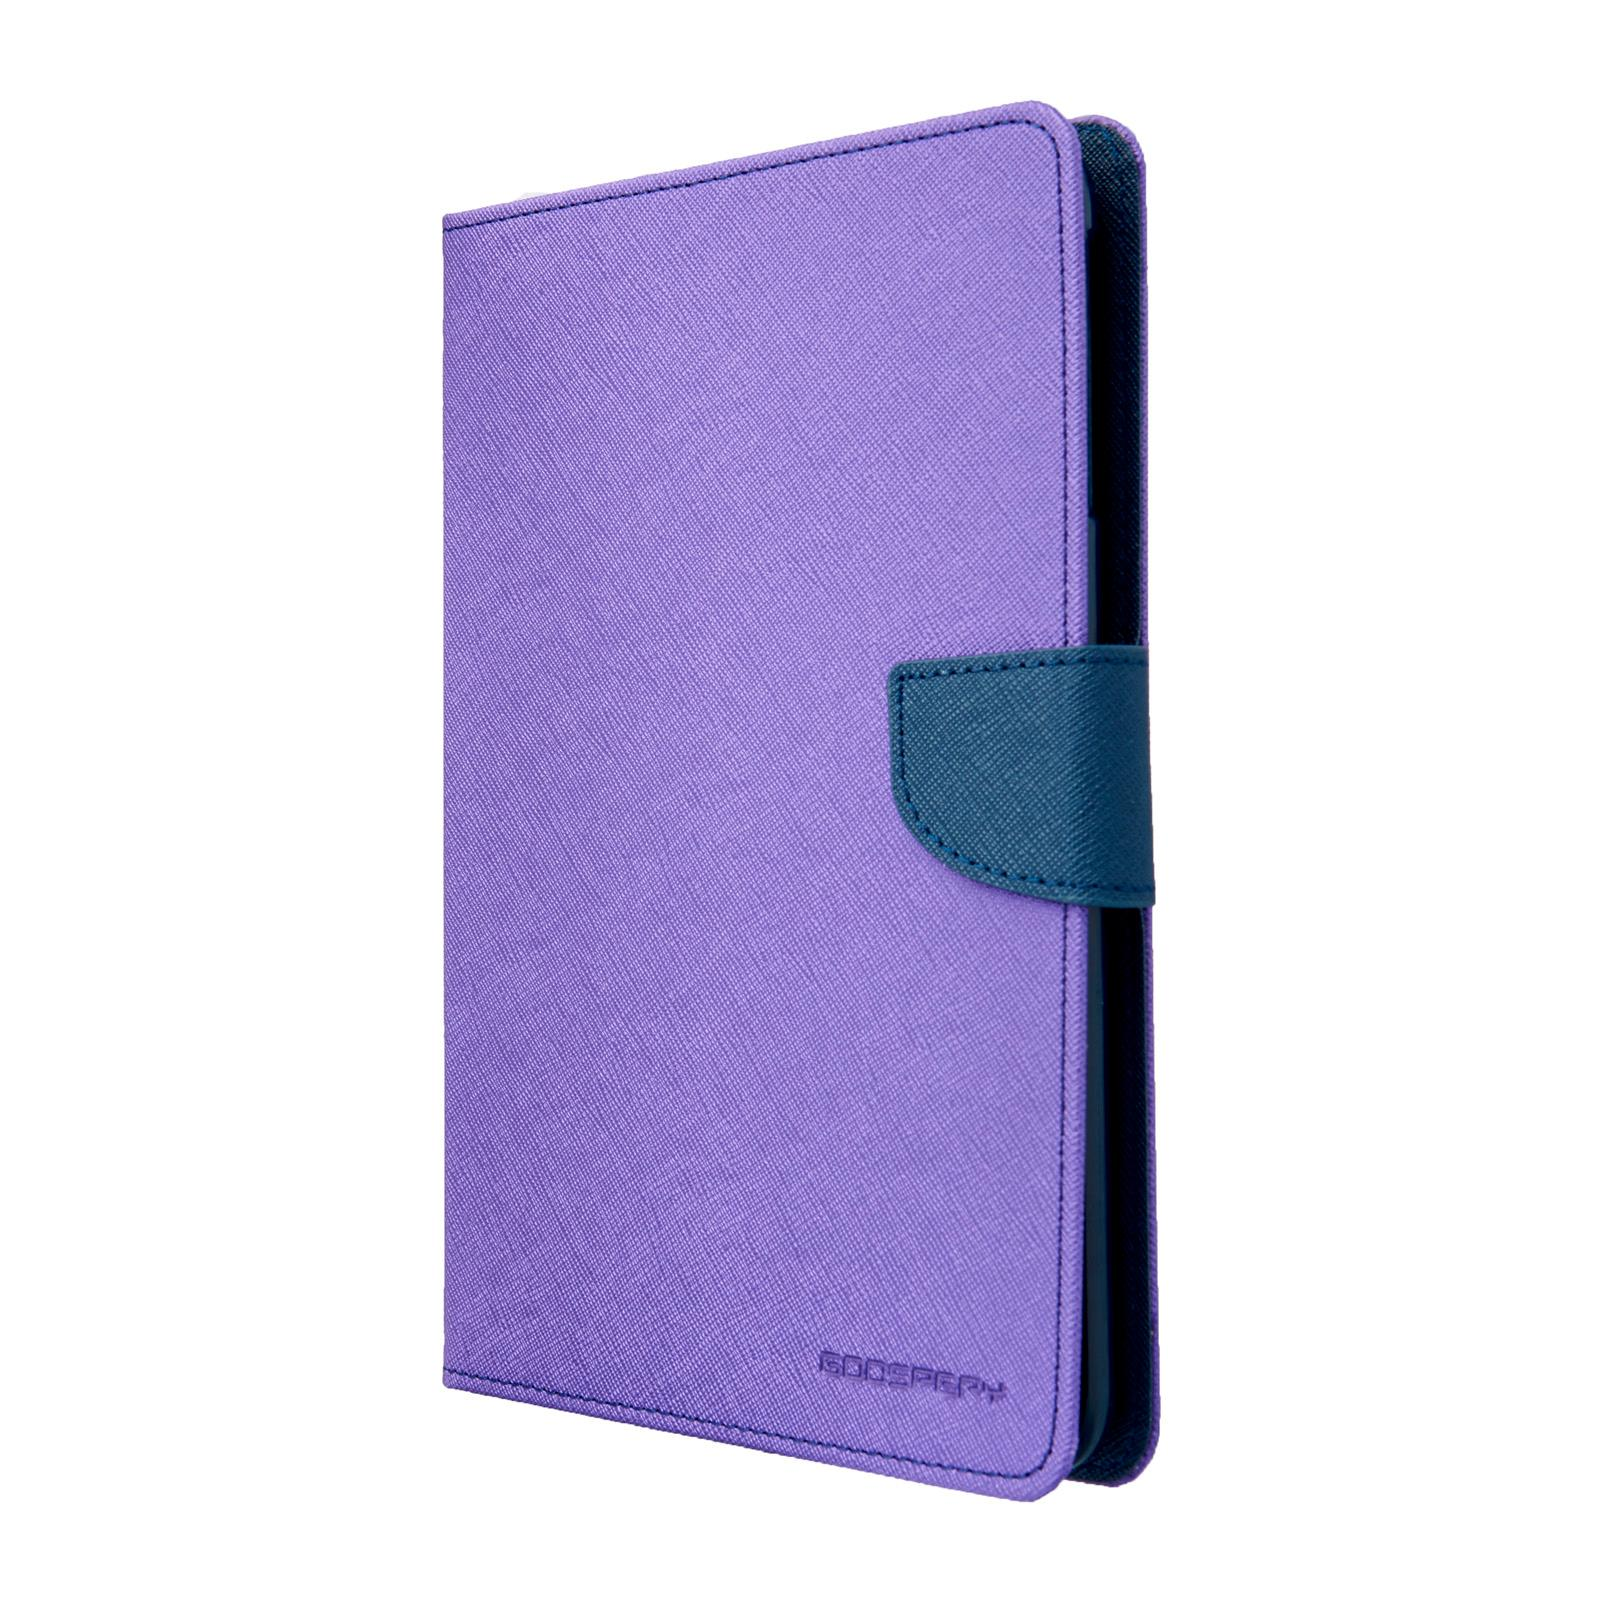 Pouzdro / kryt pro Apple iPad mini 1 / 2 / 3 - Mercury, Fancy Diary Purple/Navy